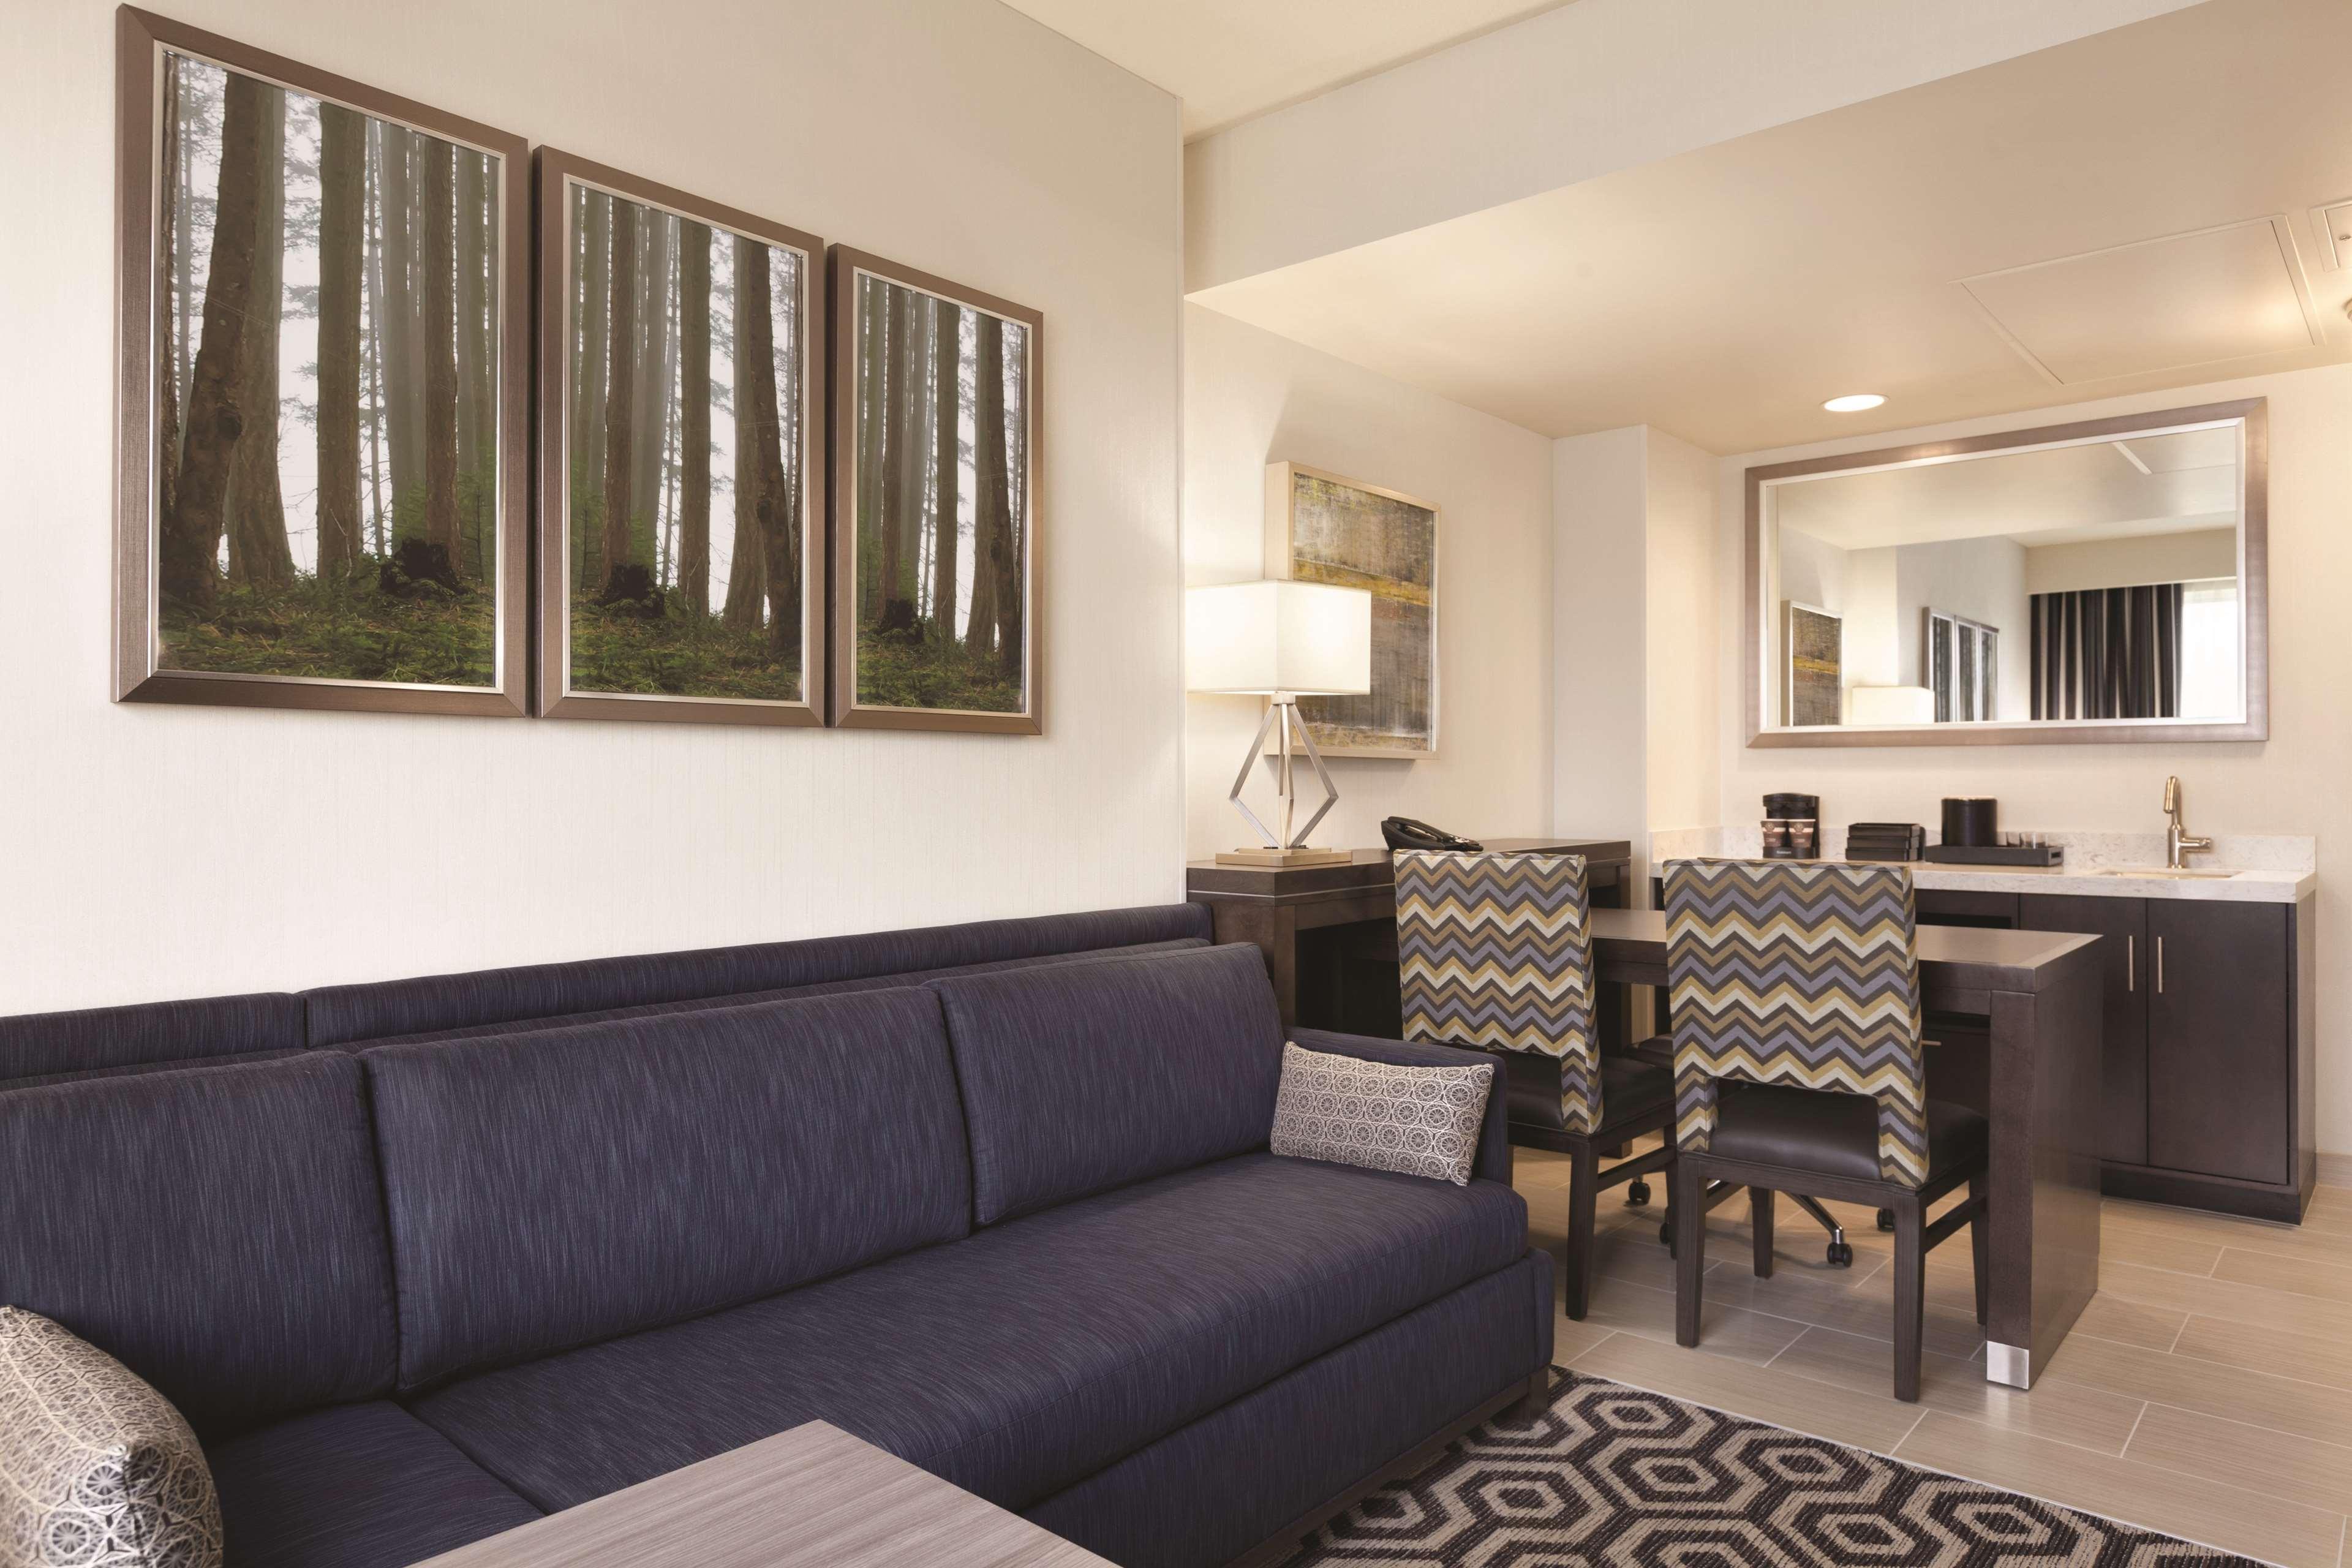 Embassy Suites by Hilton Portland Hillsboro, Oregon image 29